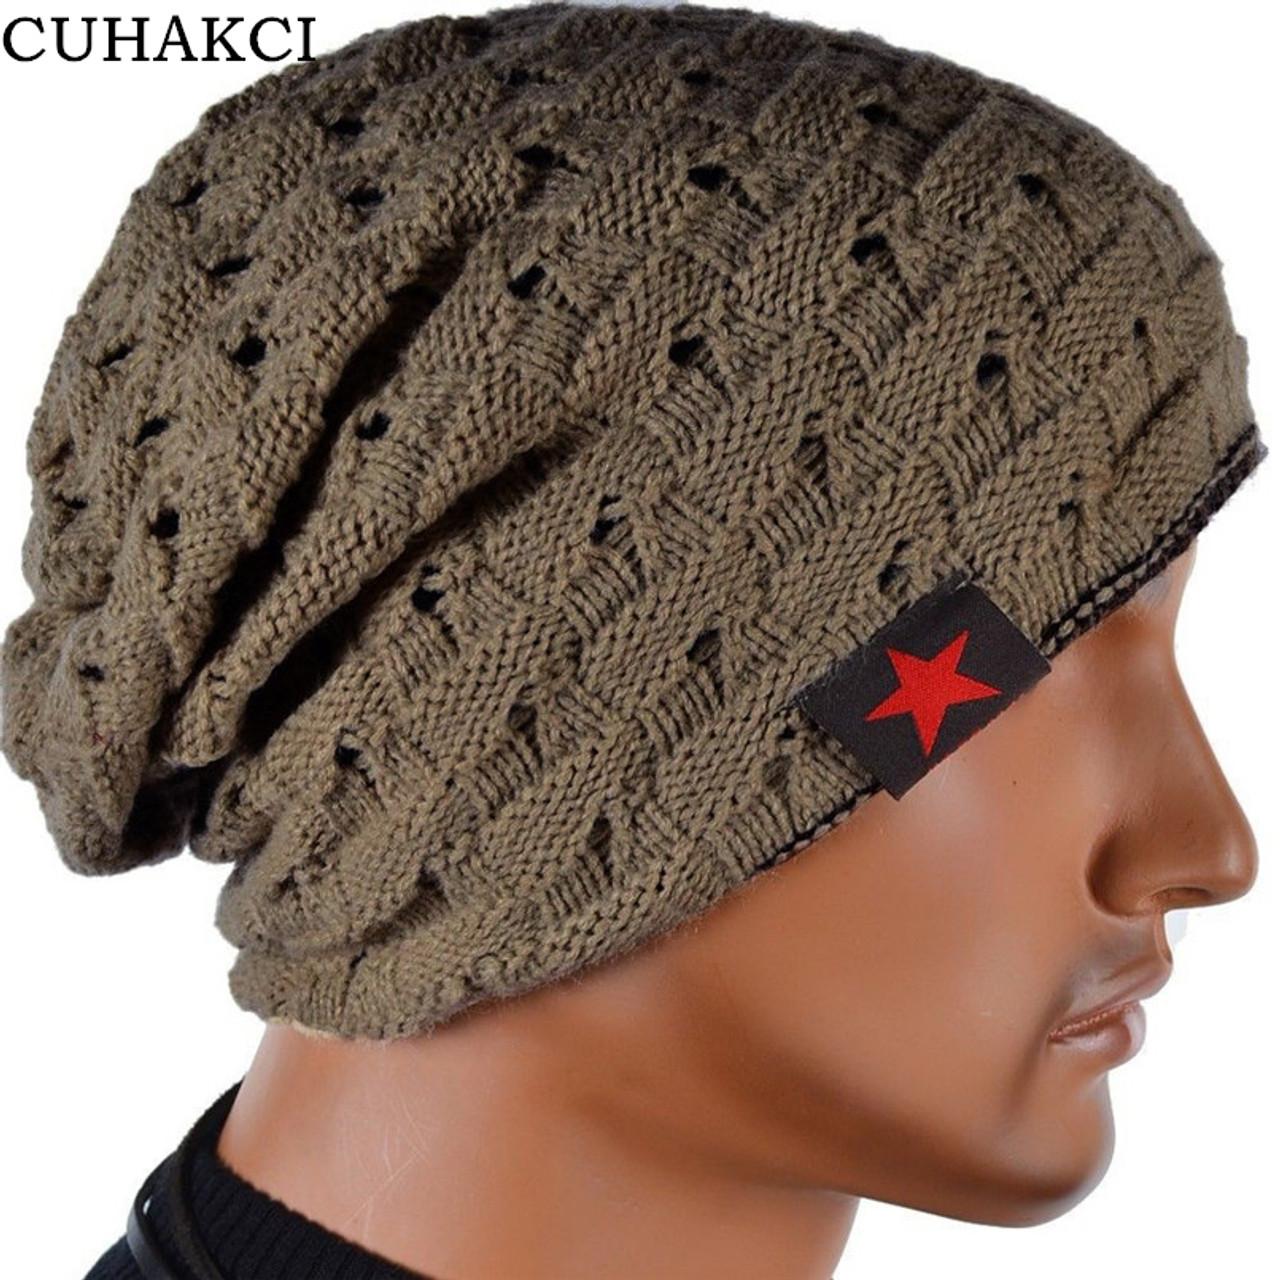 Winter Warm New Fashion For Men Skull Chunky Women Knit Beanie Reversible  Baggy Snow Cap Warm Unisex Hat 8 Colors M003 - OnshopDeals.Com 66e2e67db61